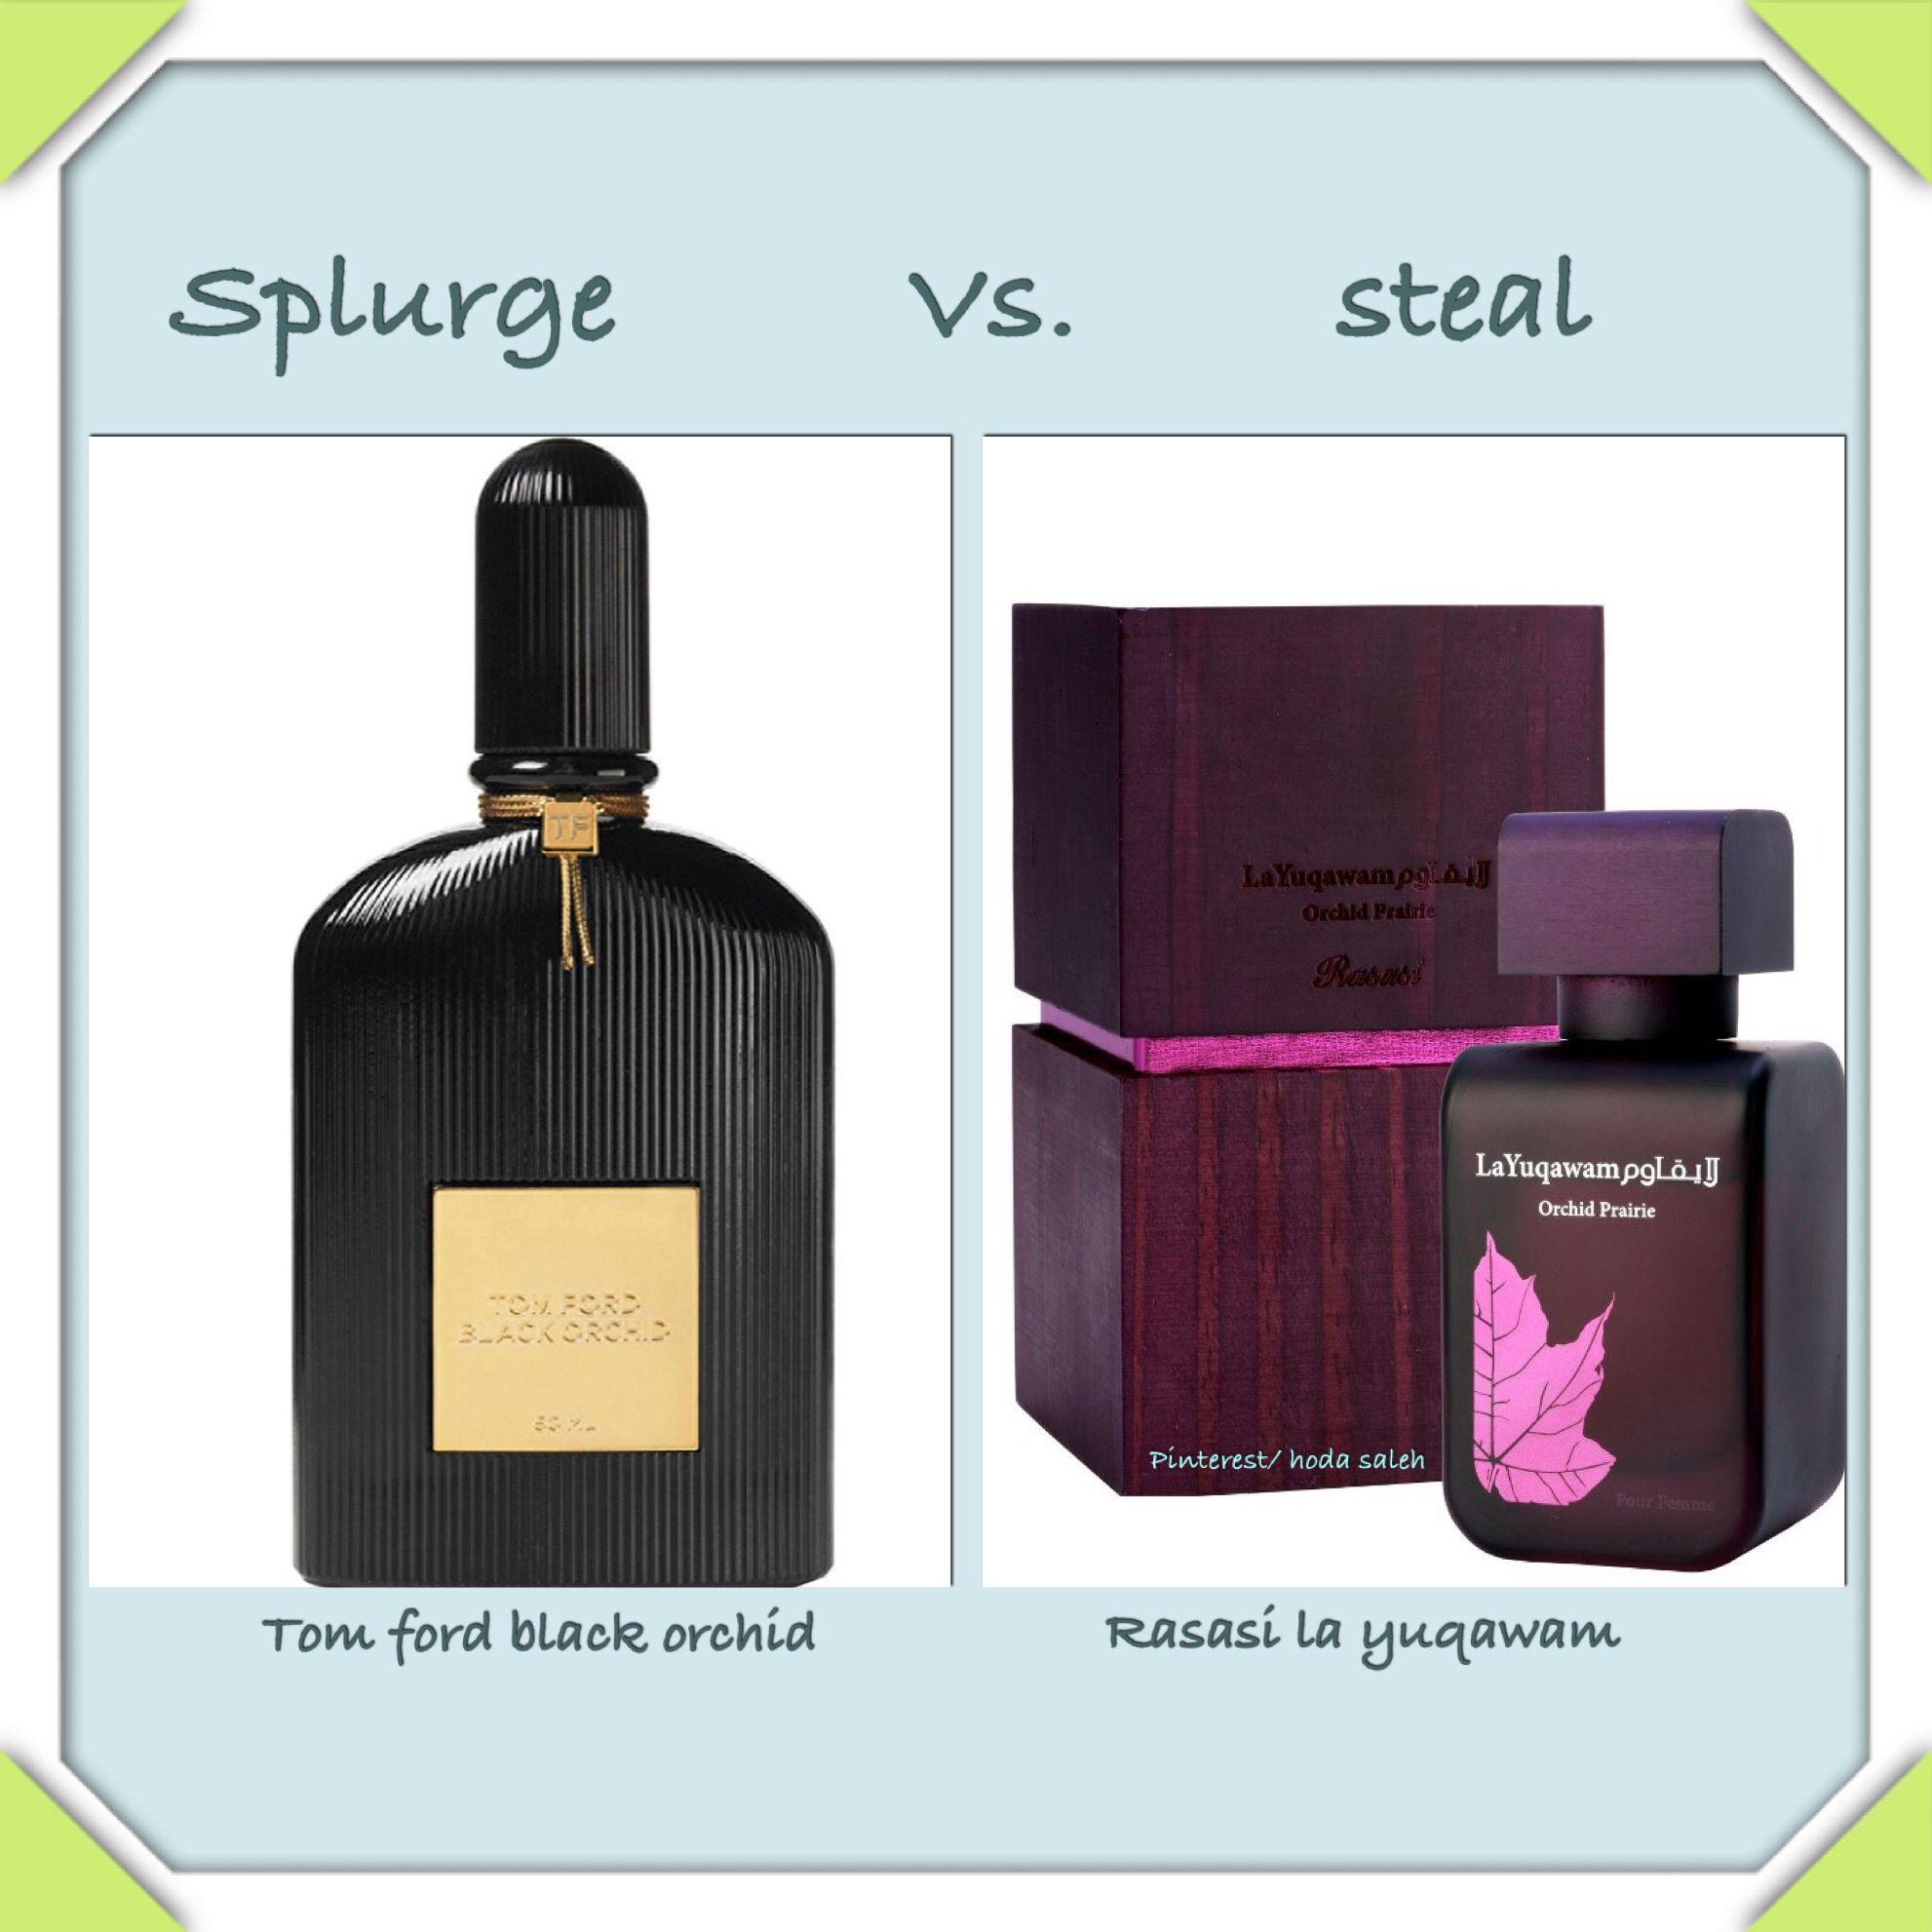 Tom Ford Black Orchid Is Similar To Rasasi La Yuqawam Perfume